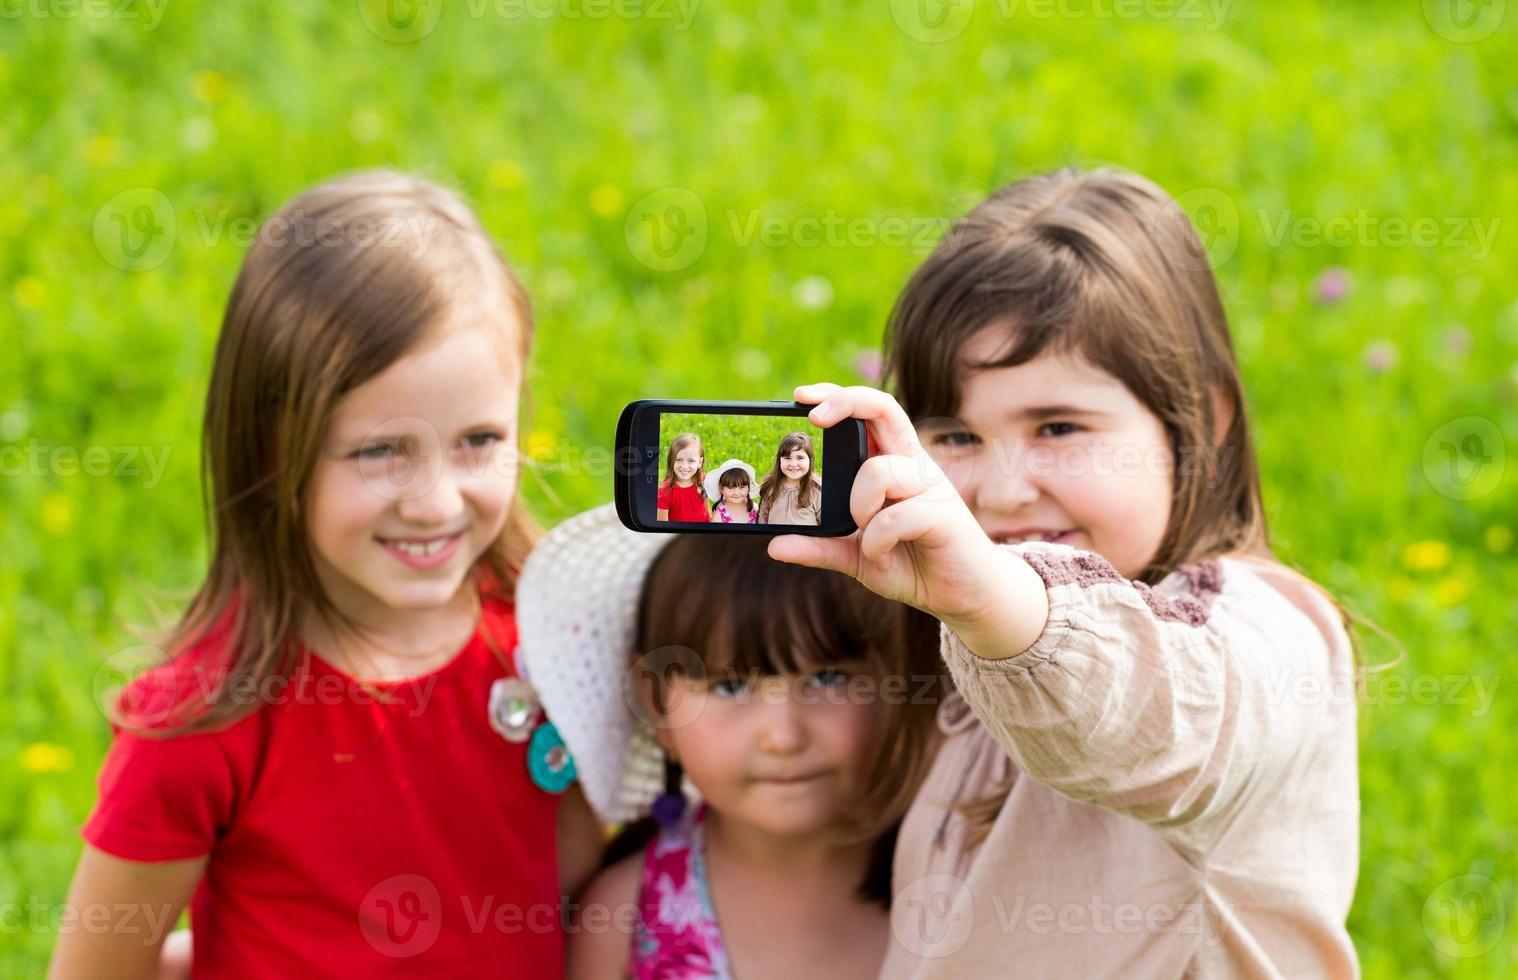 Lass uns ein paar Selfies machen! foto